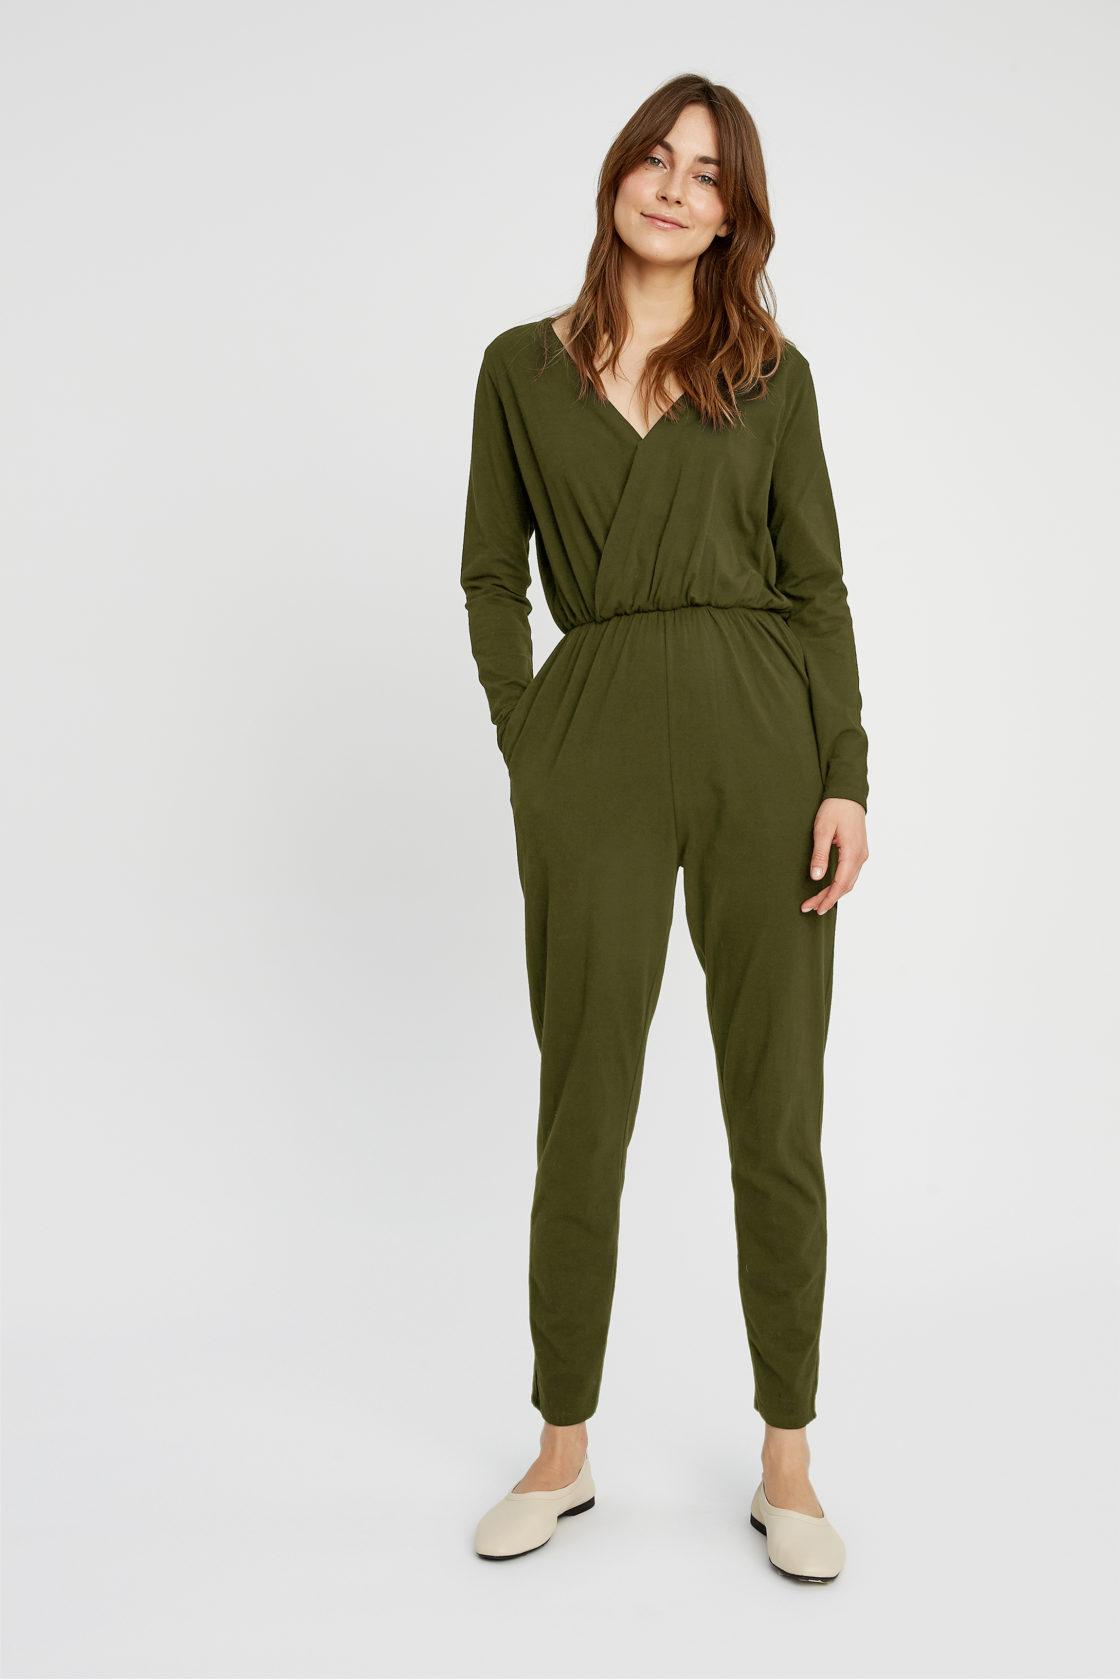 Roberta Organic Fashion Peopletree Jumpsuit Odette Khaki 1